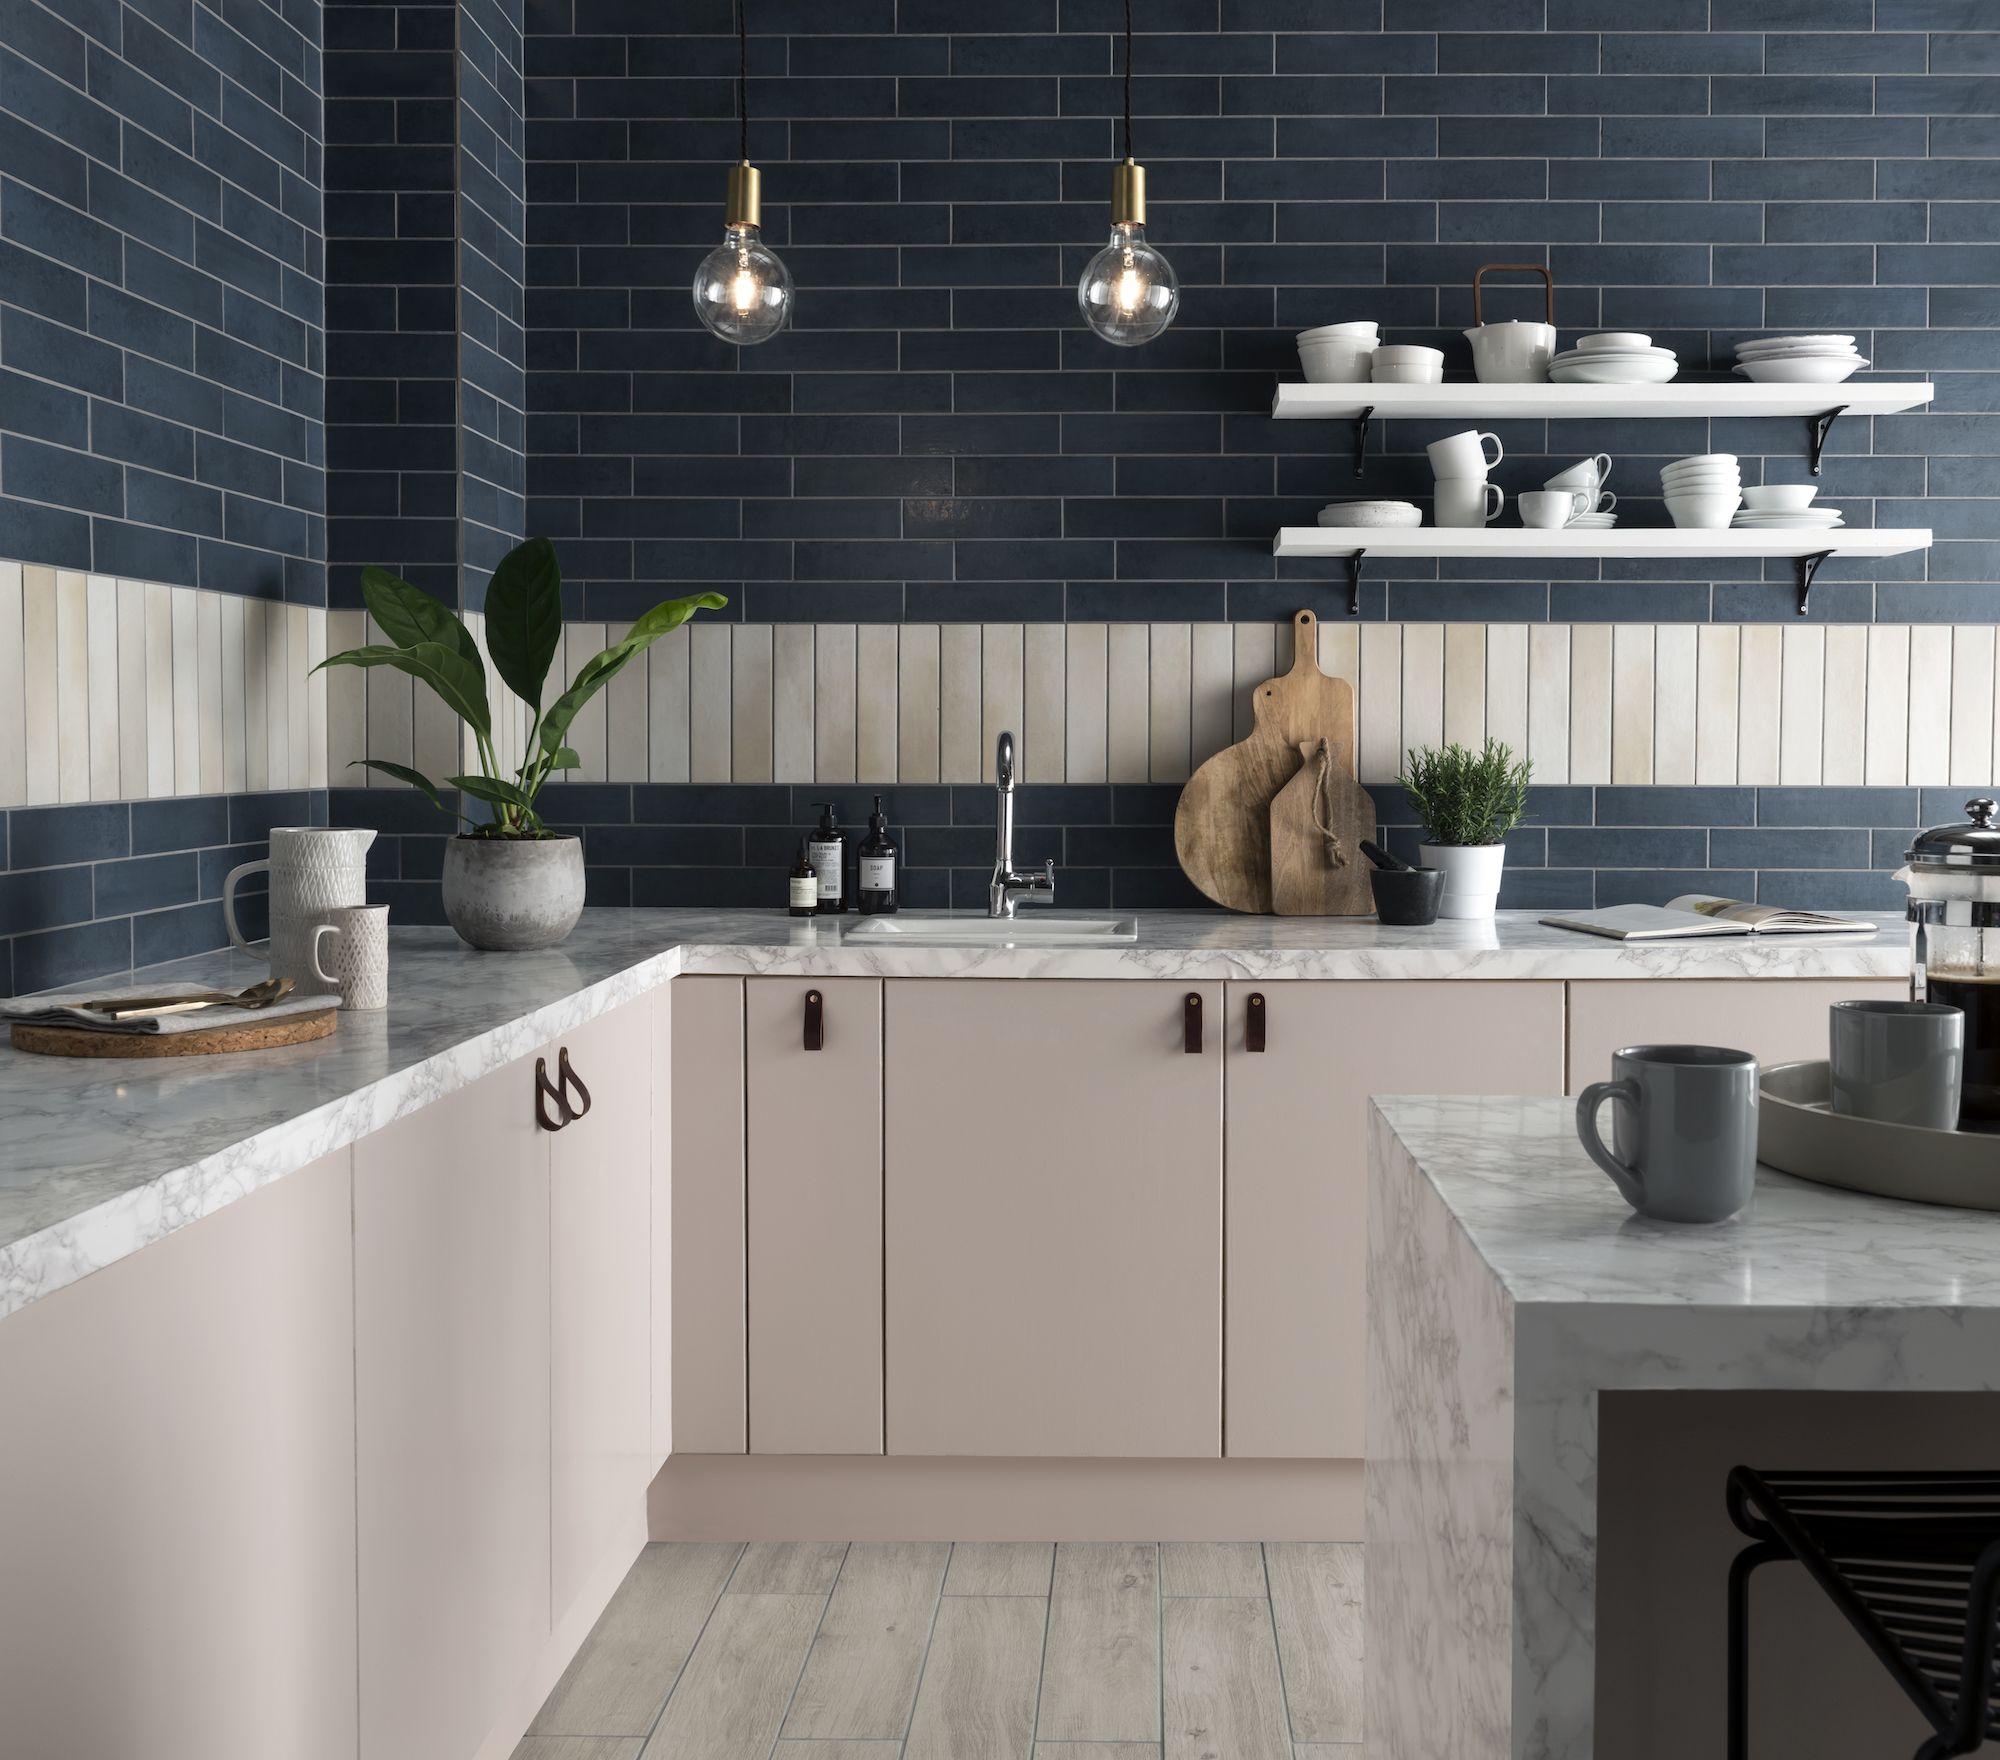 anya ocean deep blue tile topps tiles mood board ideas in 2019 rh pinterest co uk